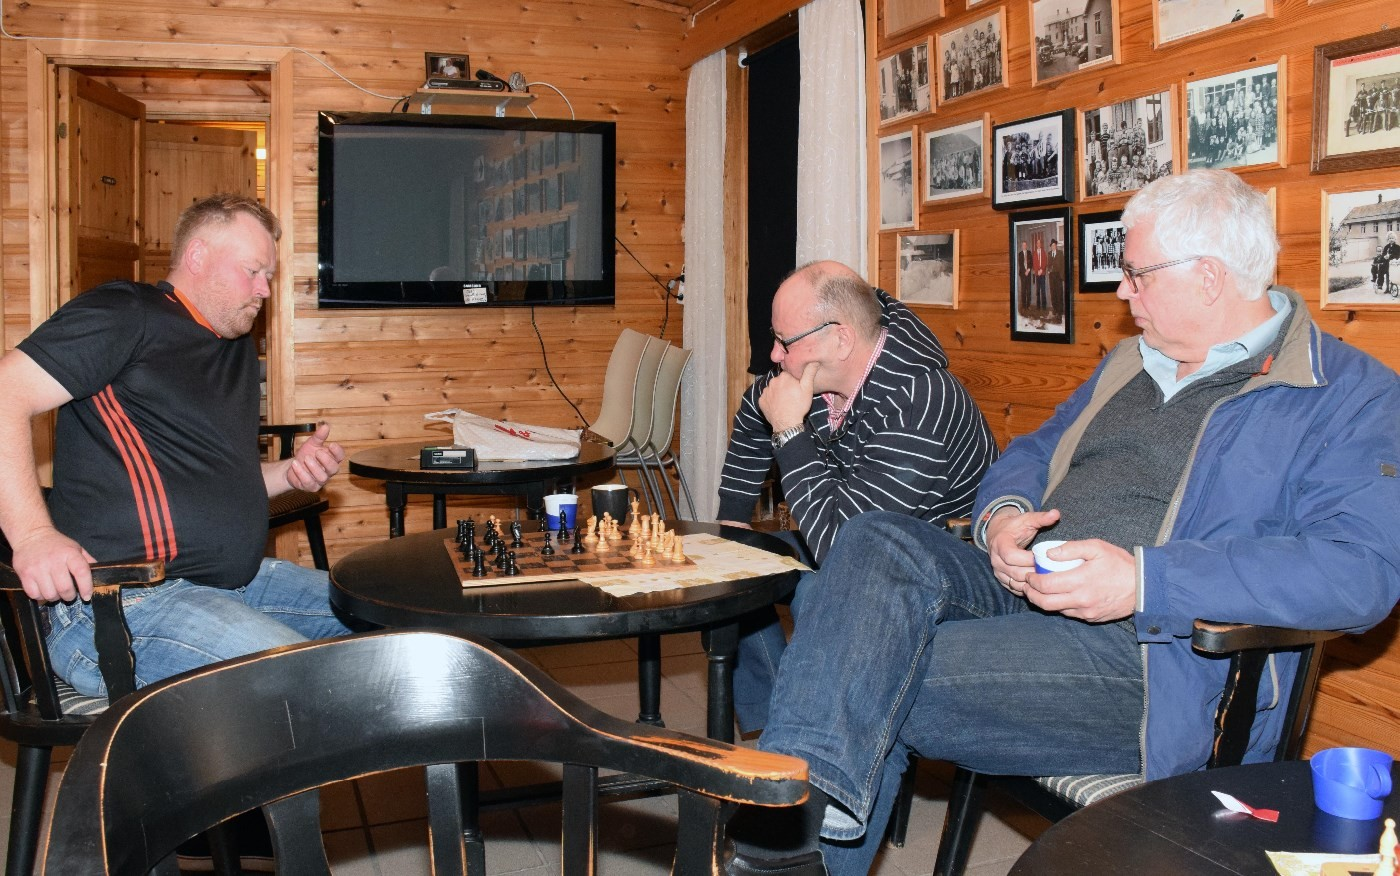 Ståle Ansnes og Terje Nordvik i ein sjakk-duell, medan Anders Talgø følgjer med kva som foregår på brettet.  Foto: Jon Olav Ørsal